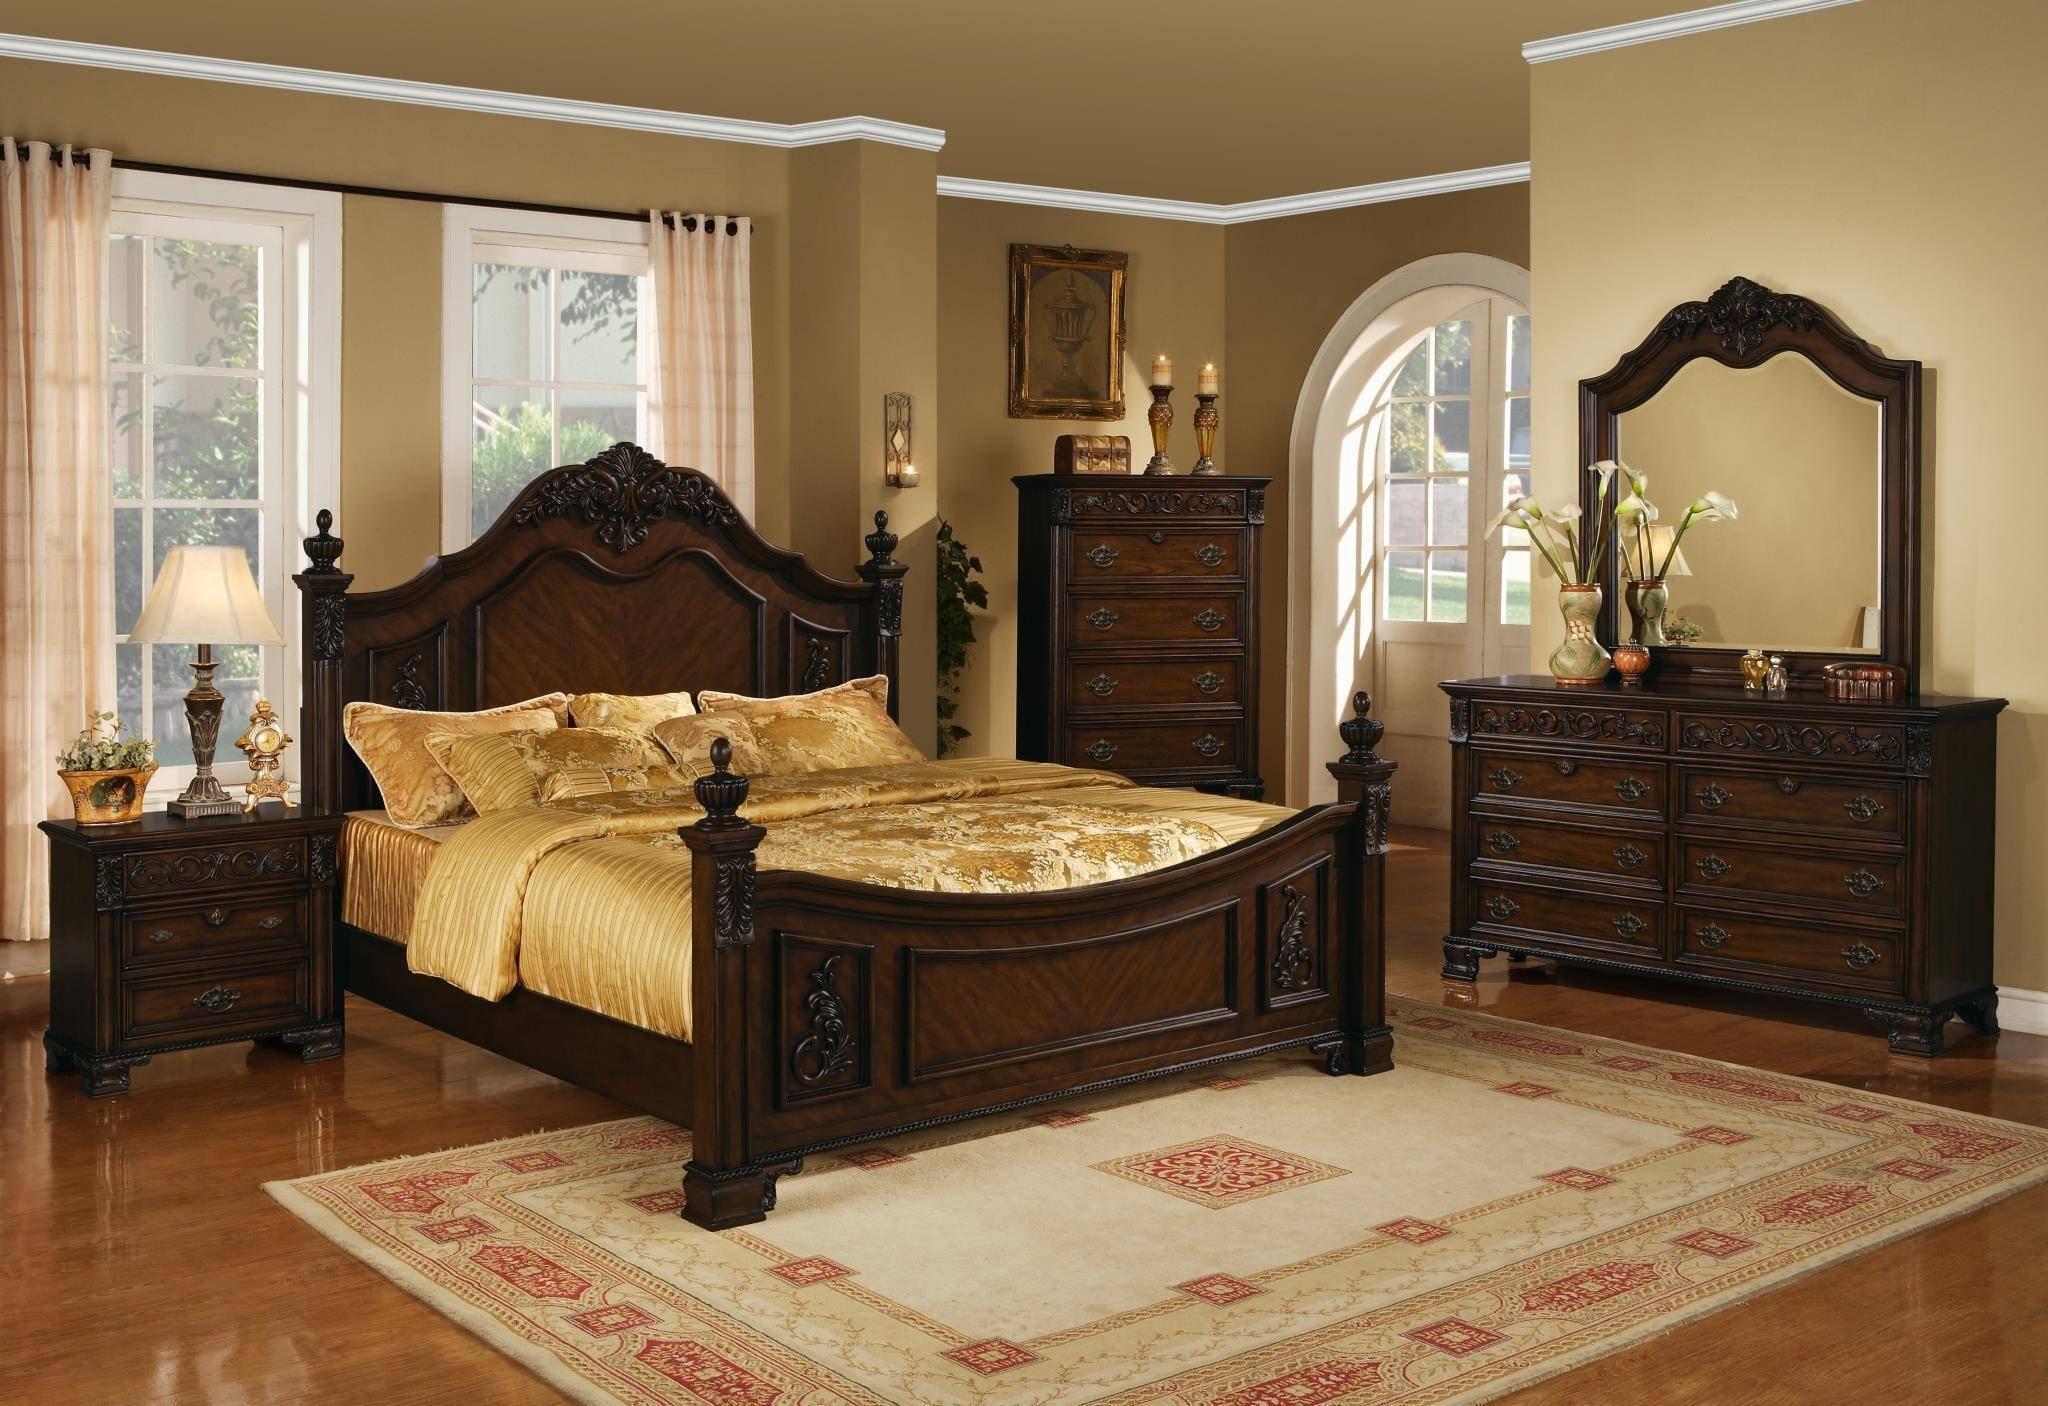 Solid Cherry Wood Bedroom Furniture Inspirational Myco Furniture Ke180k Kensington Dark Cherry Finish Luxury